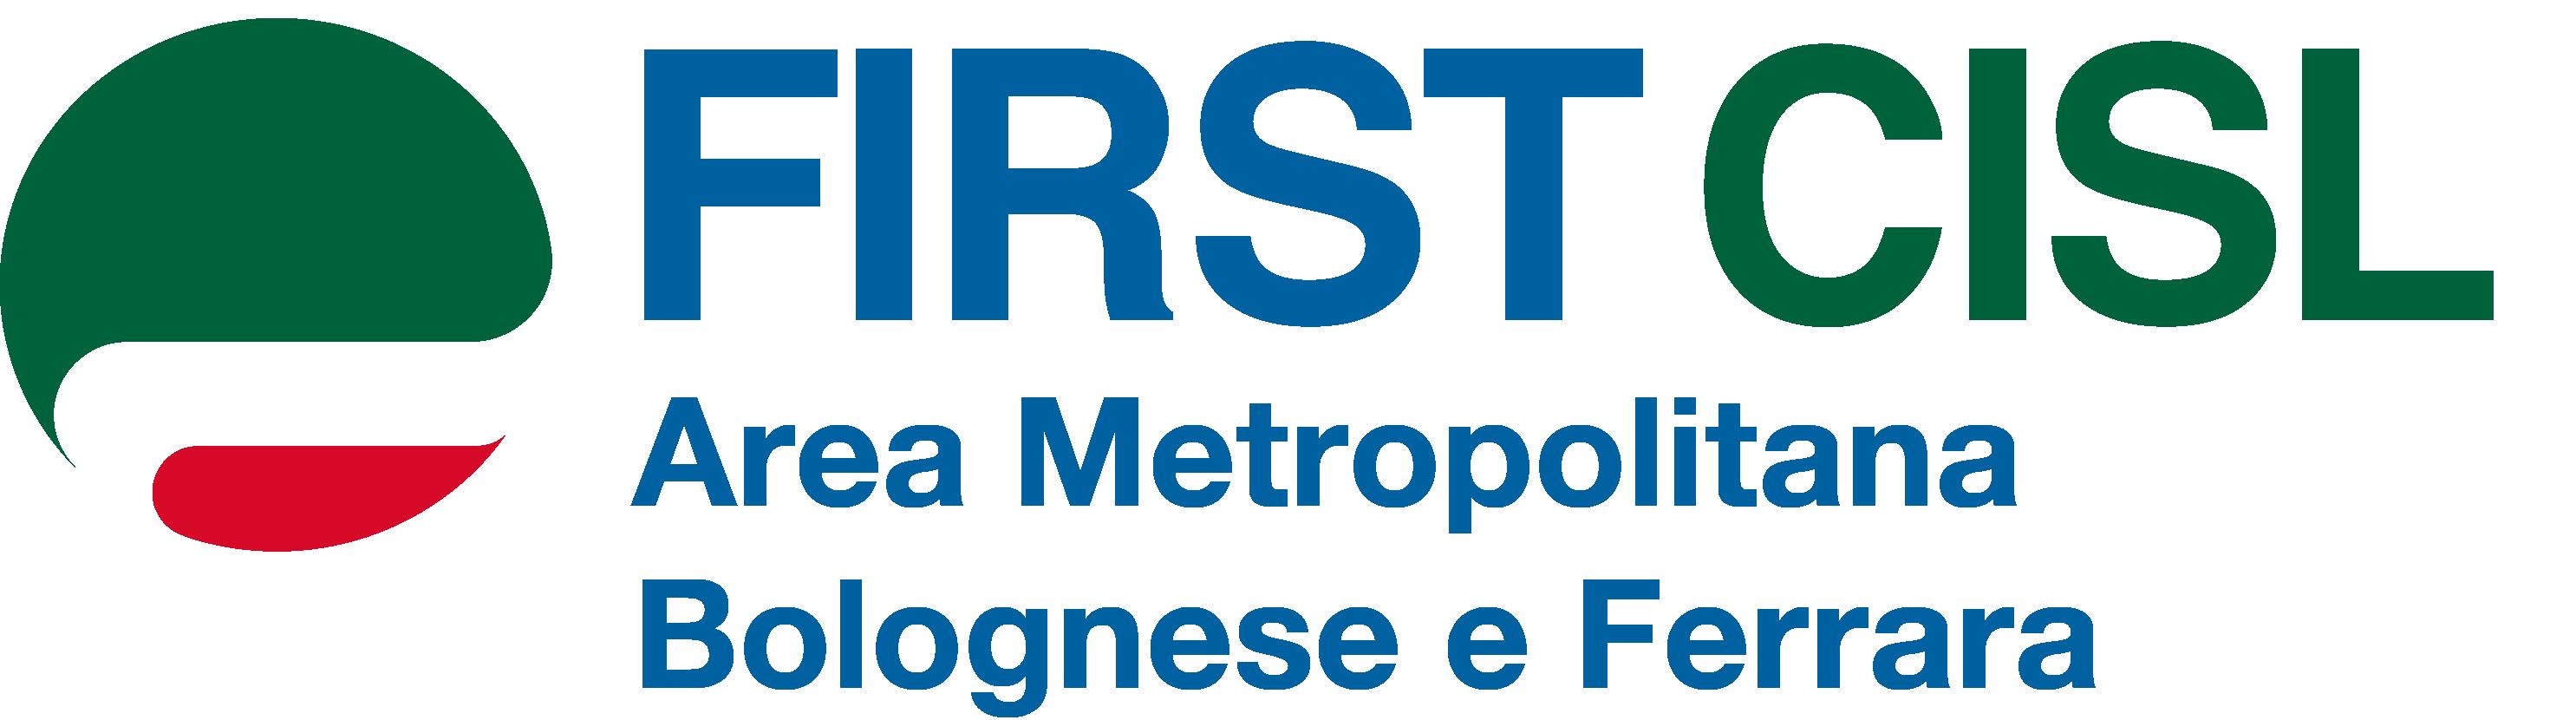 FIRST Area Metropolitana Bolognese e Ferrara